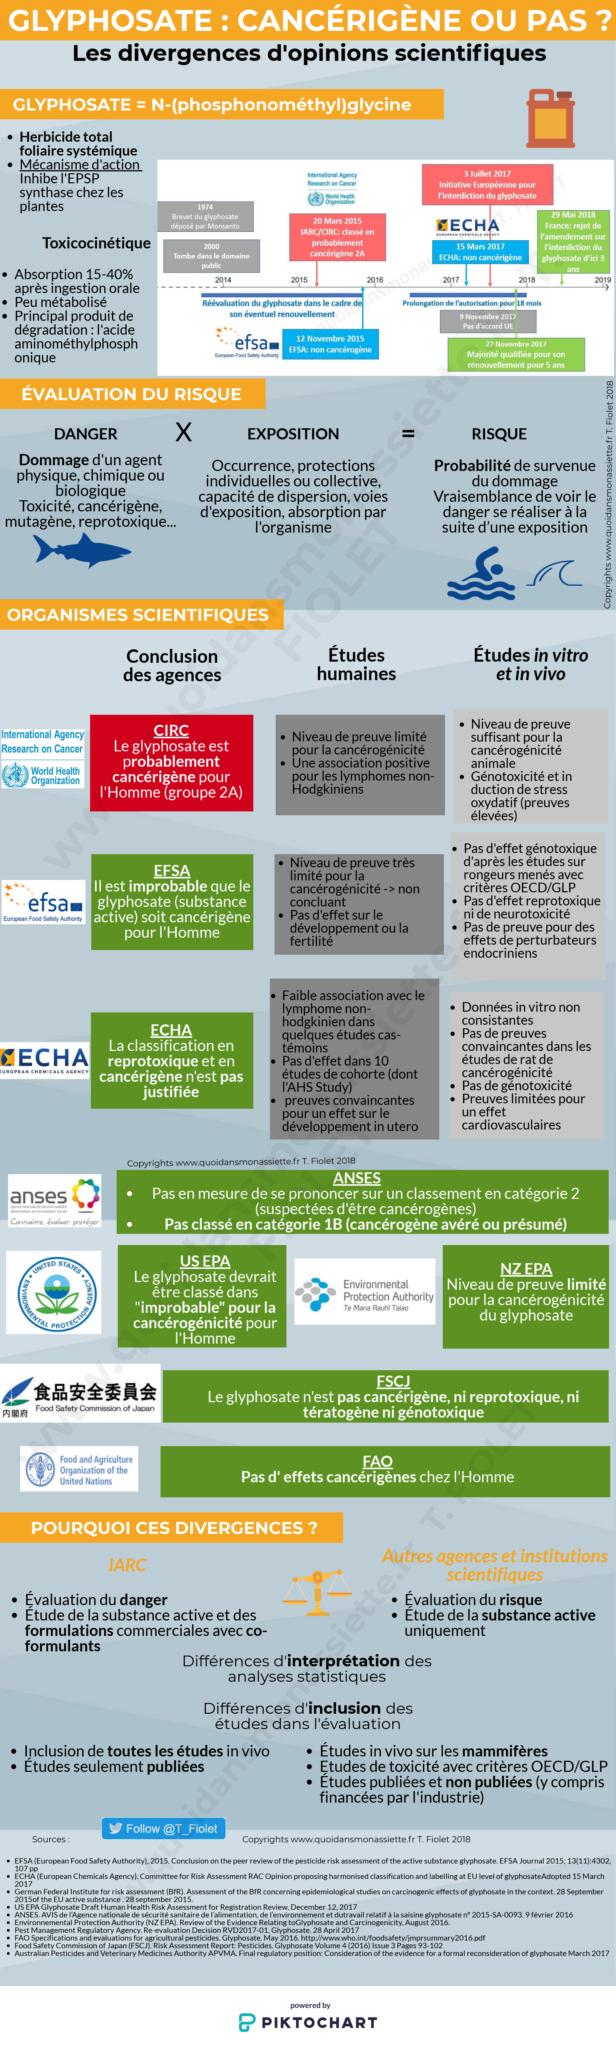 glyphosate infographie cancerigène IARC CIRC EFSA ECHA cancer